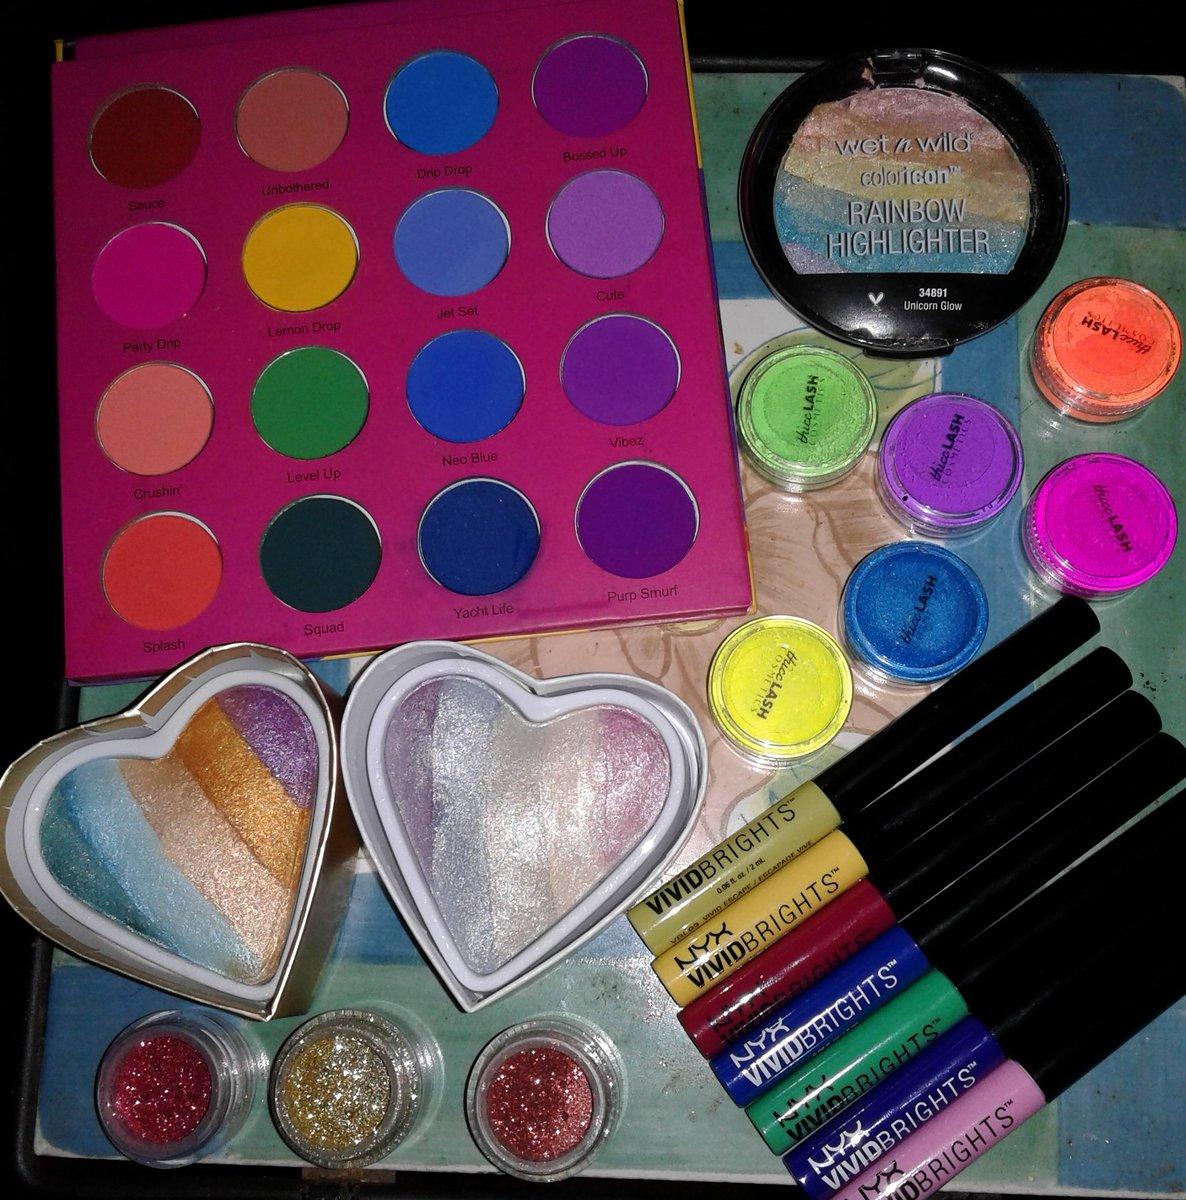 Bright & Beautiful @ColouredRaine @wetnwildbeauty @MakeupRevUSA @NyxCosmetics @ThiccLash #makeup #makeupartist #mua #MOTD #makeupaddict #beauty #glitter #neonmakeup #makeupflatlay #SundayMorning #makeupobsessed #makeuploverpic.twitter.com/U2ixI5GcBw